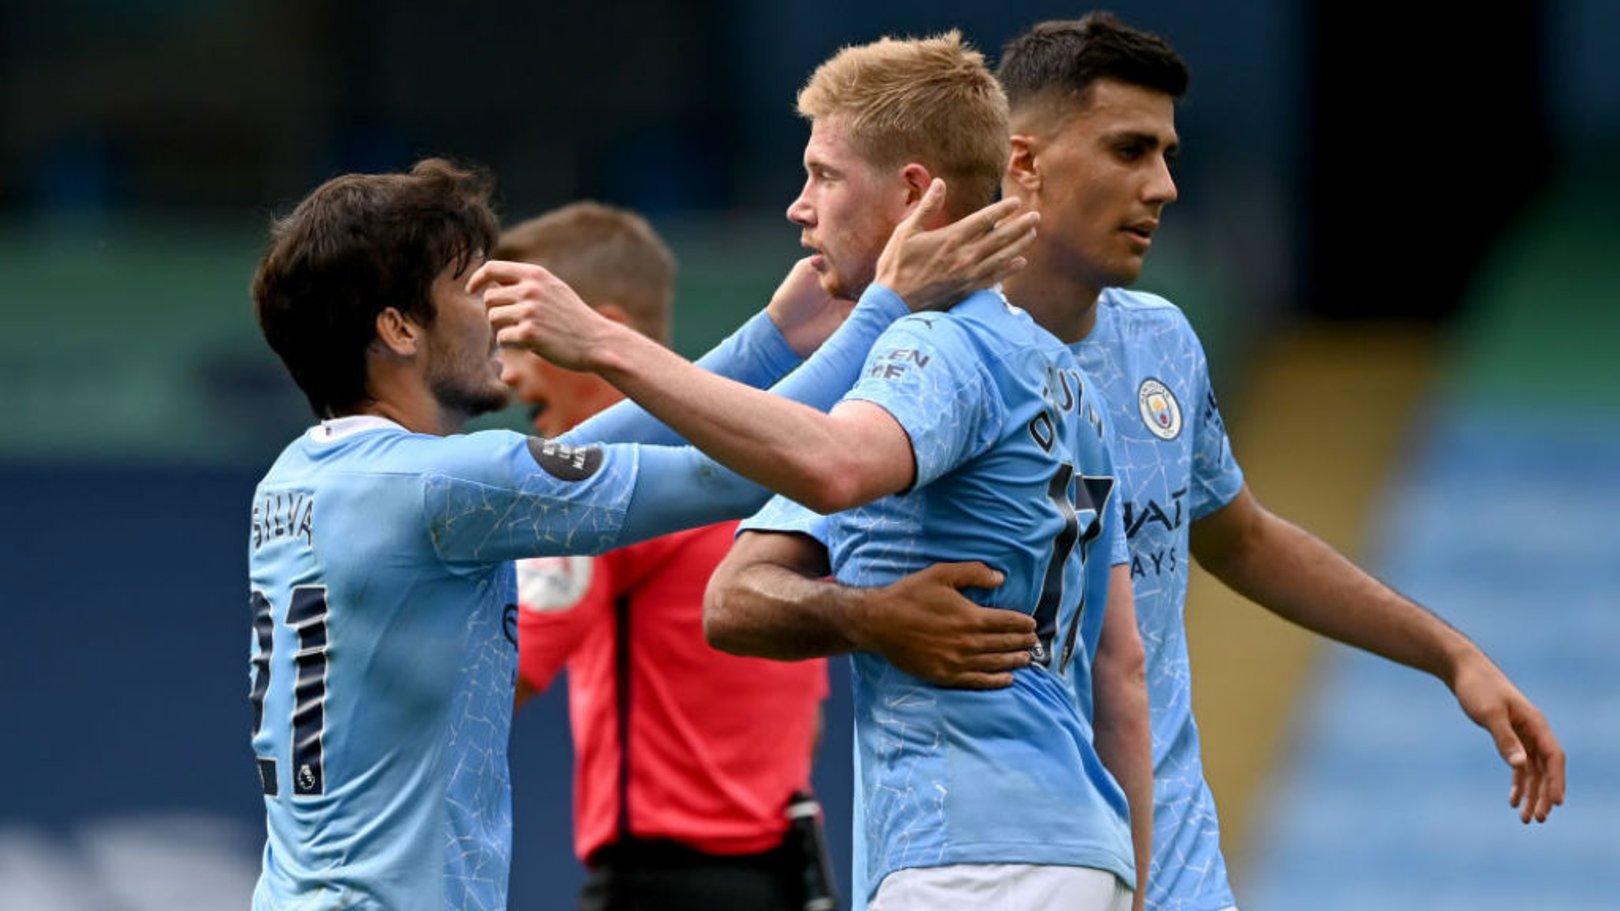 Silva, De Bruyne nominated for July Goal of the Month award